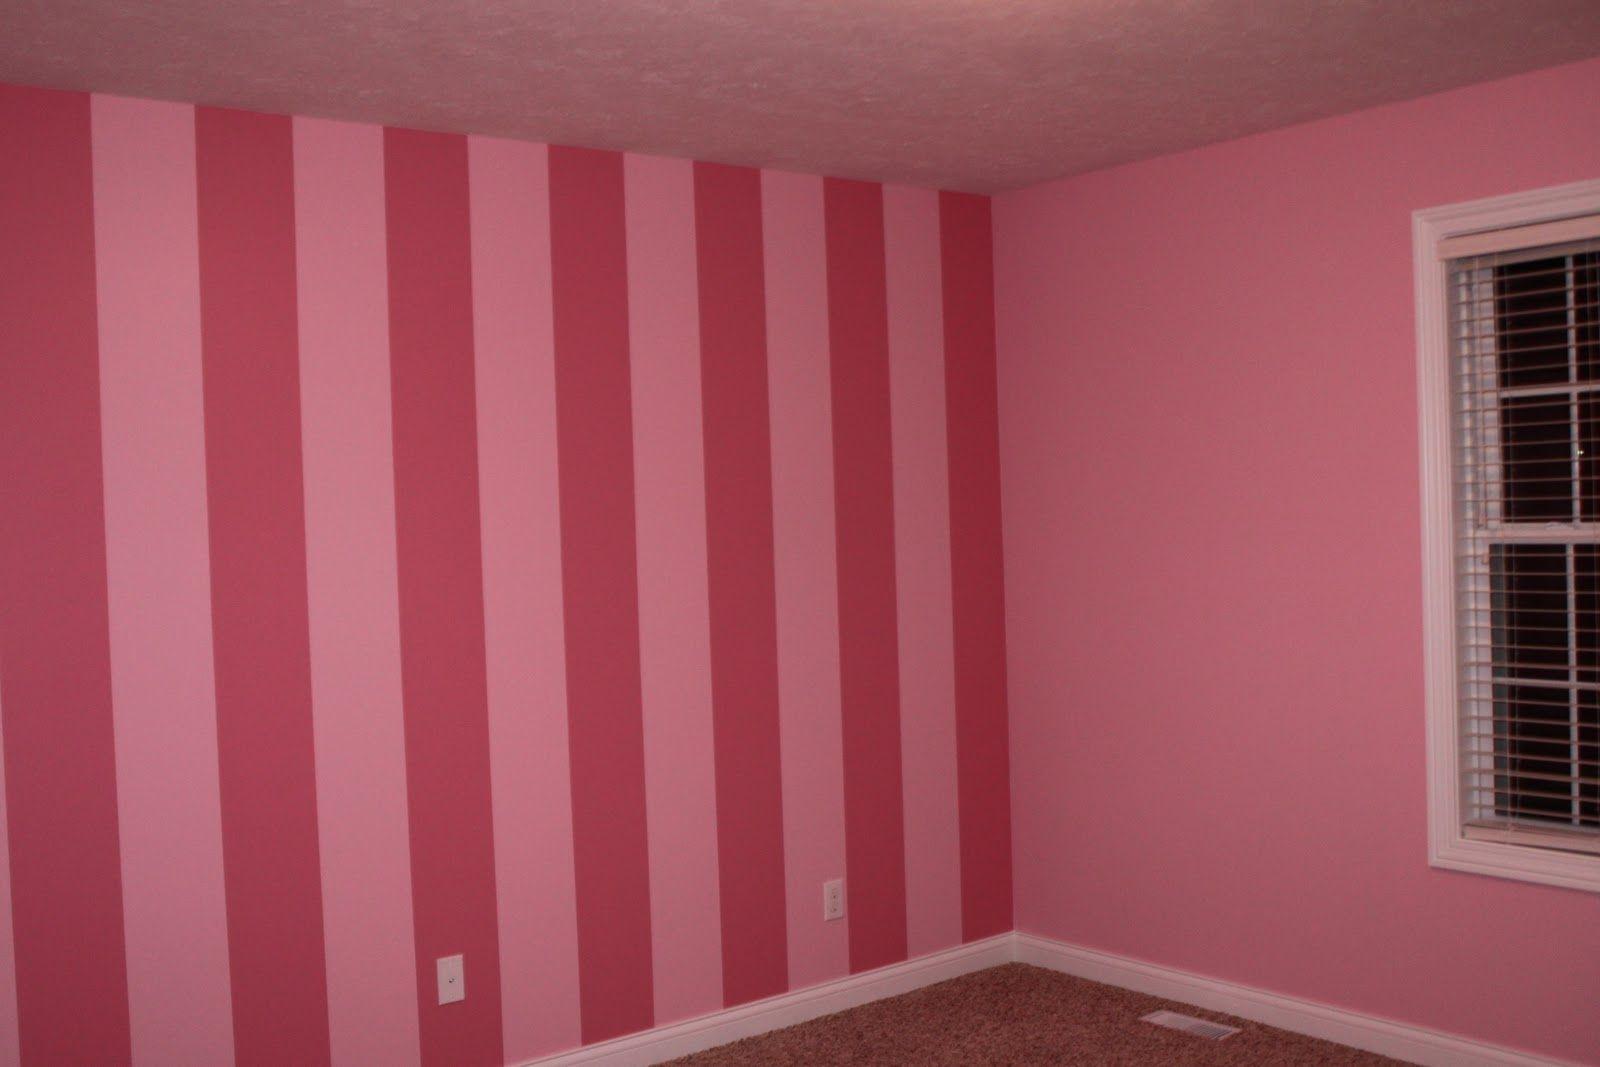 Victoria secrets style wallpaper for bedroom...